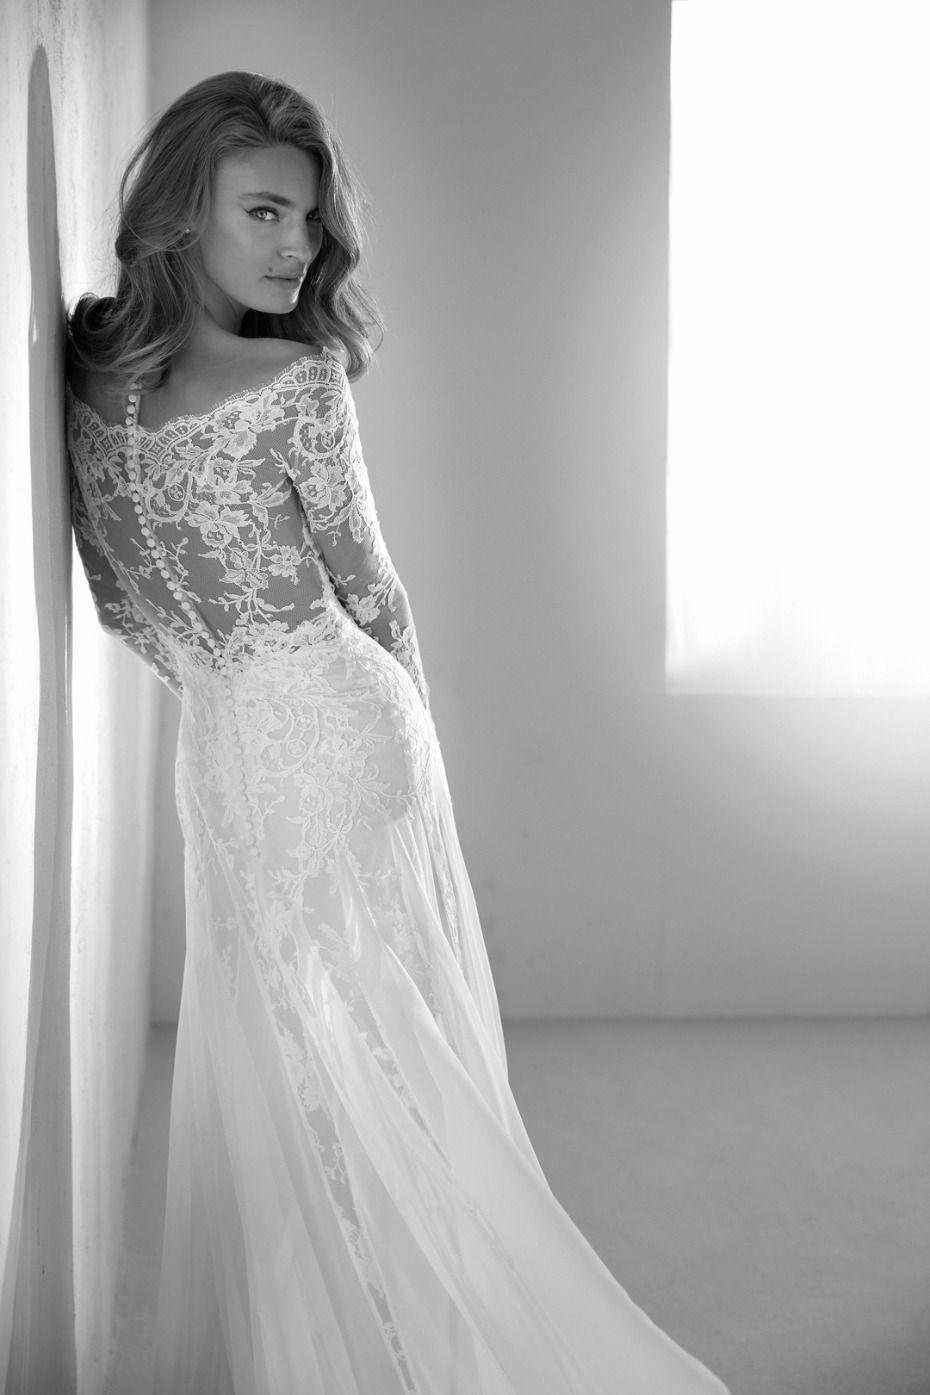 Anastasia S Wedding Look From 50 Shades Freed Get The Look Provonias Wedding Dress Wedding Dresses Sheer Sleeves Wedding Dresses [ 1395 x 930 Pixel ]